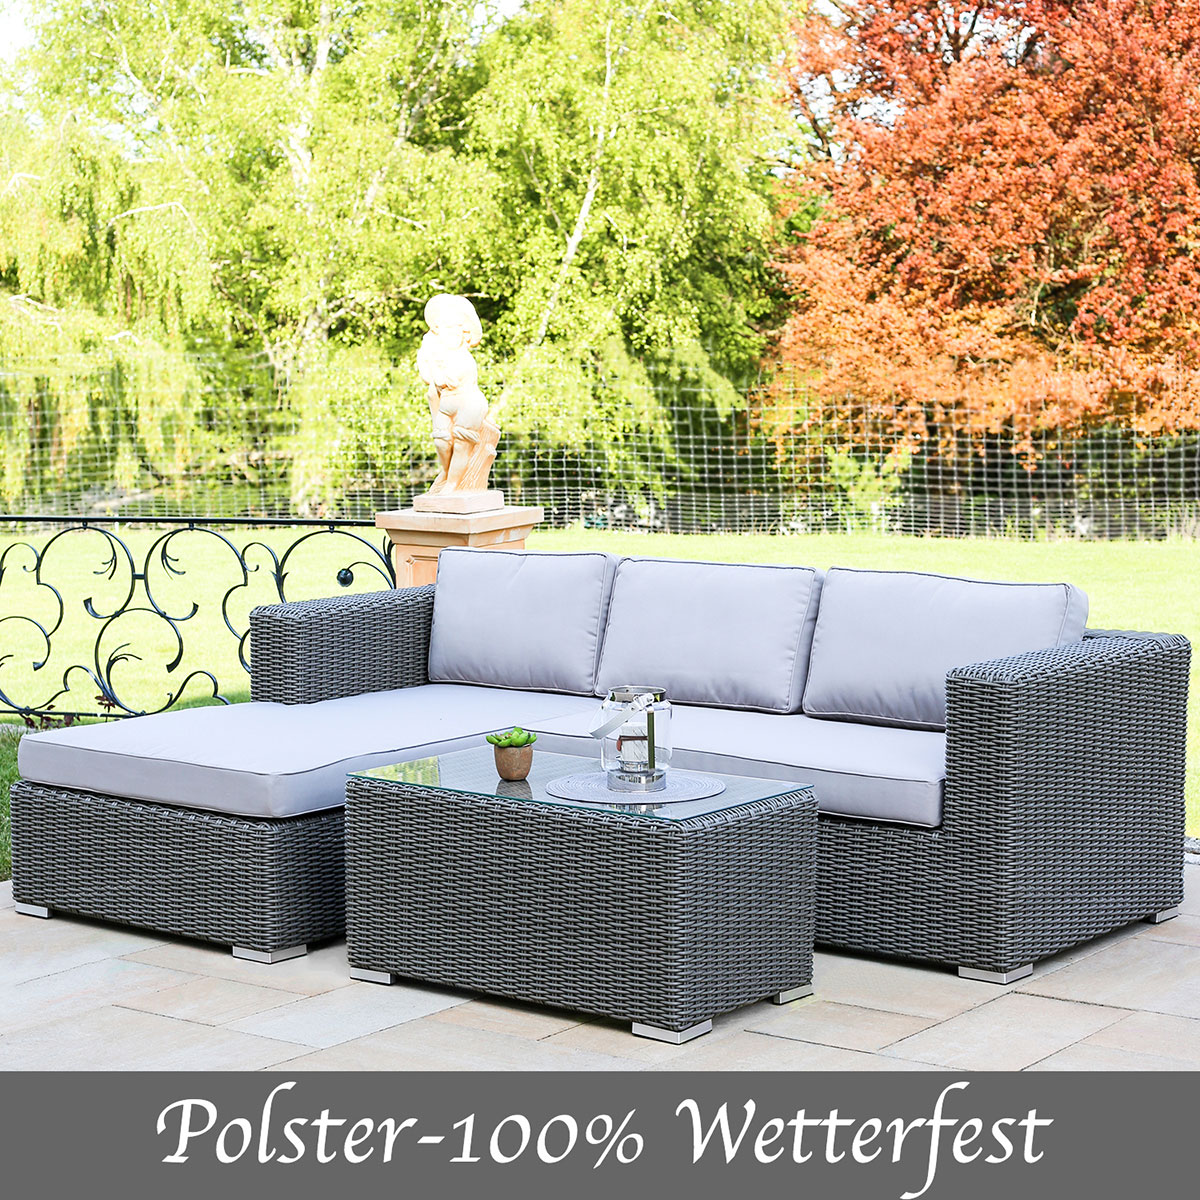 Polyrattan Gartenmöbel Lounge - Lounge Möbel Eckgruppe, Lounge Set ...